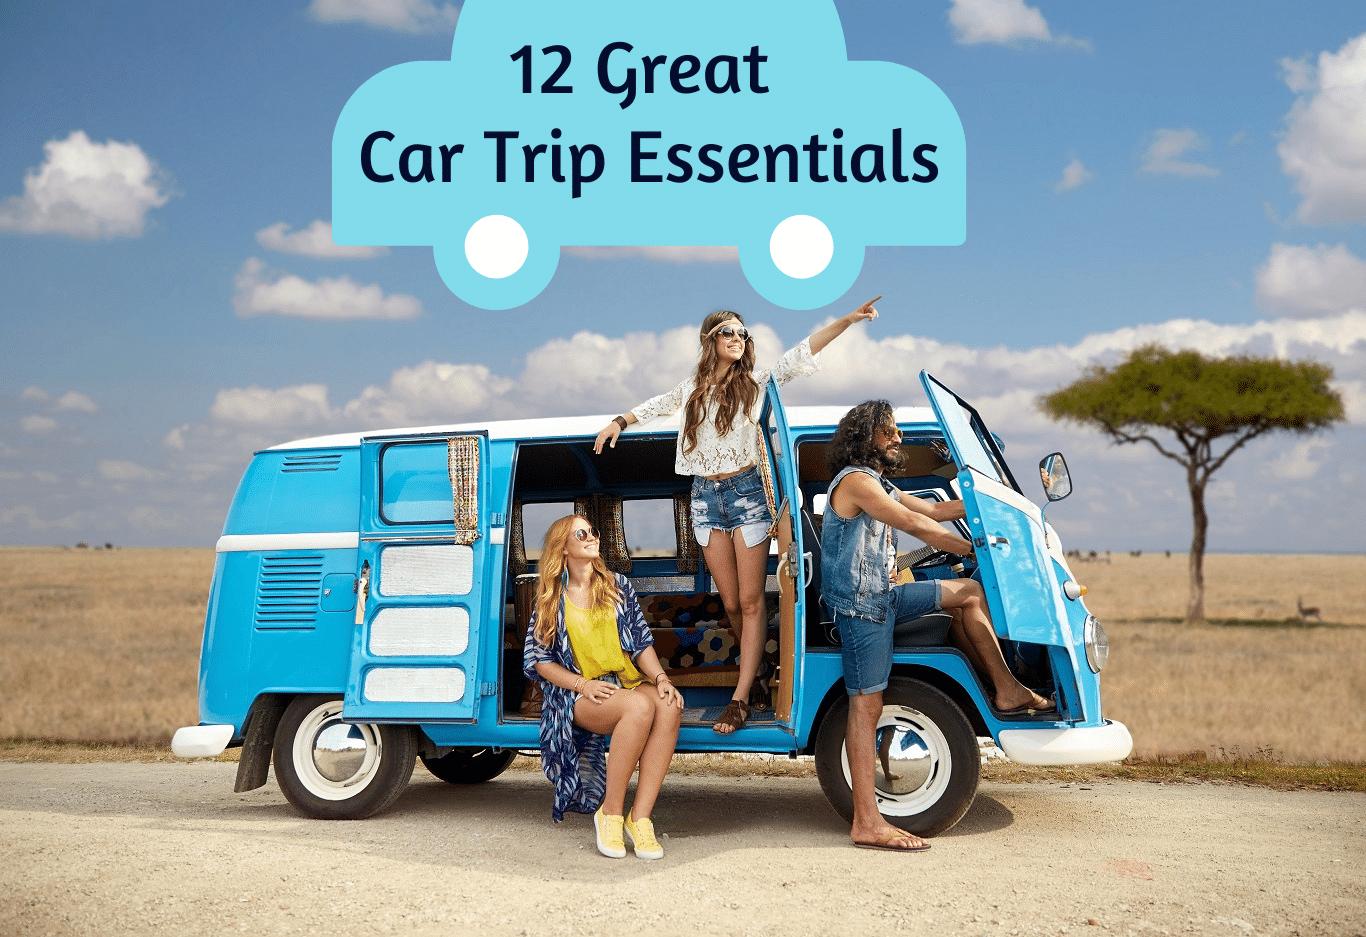 12 Great Car Trip Essentials